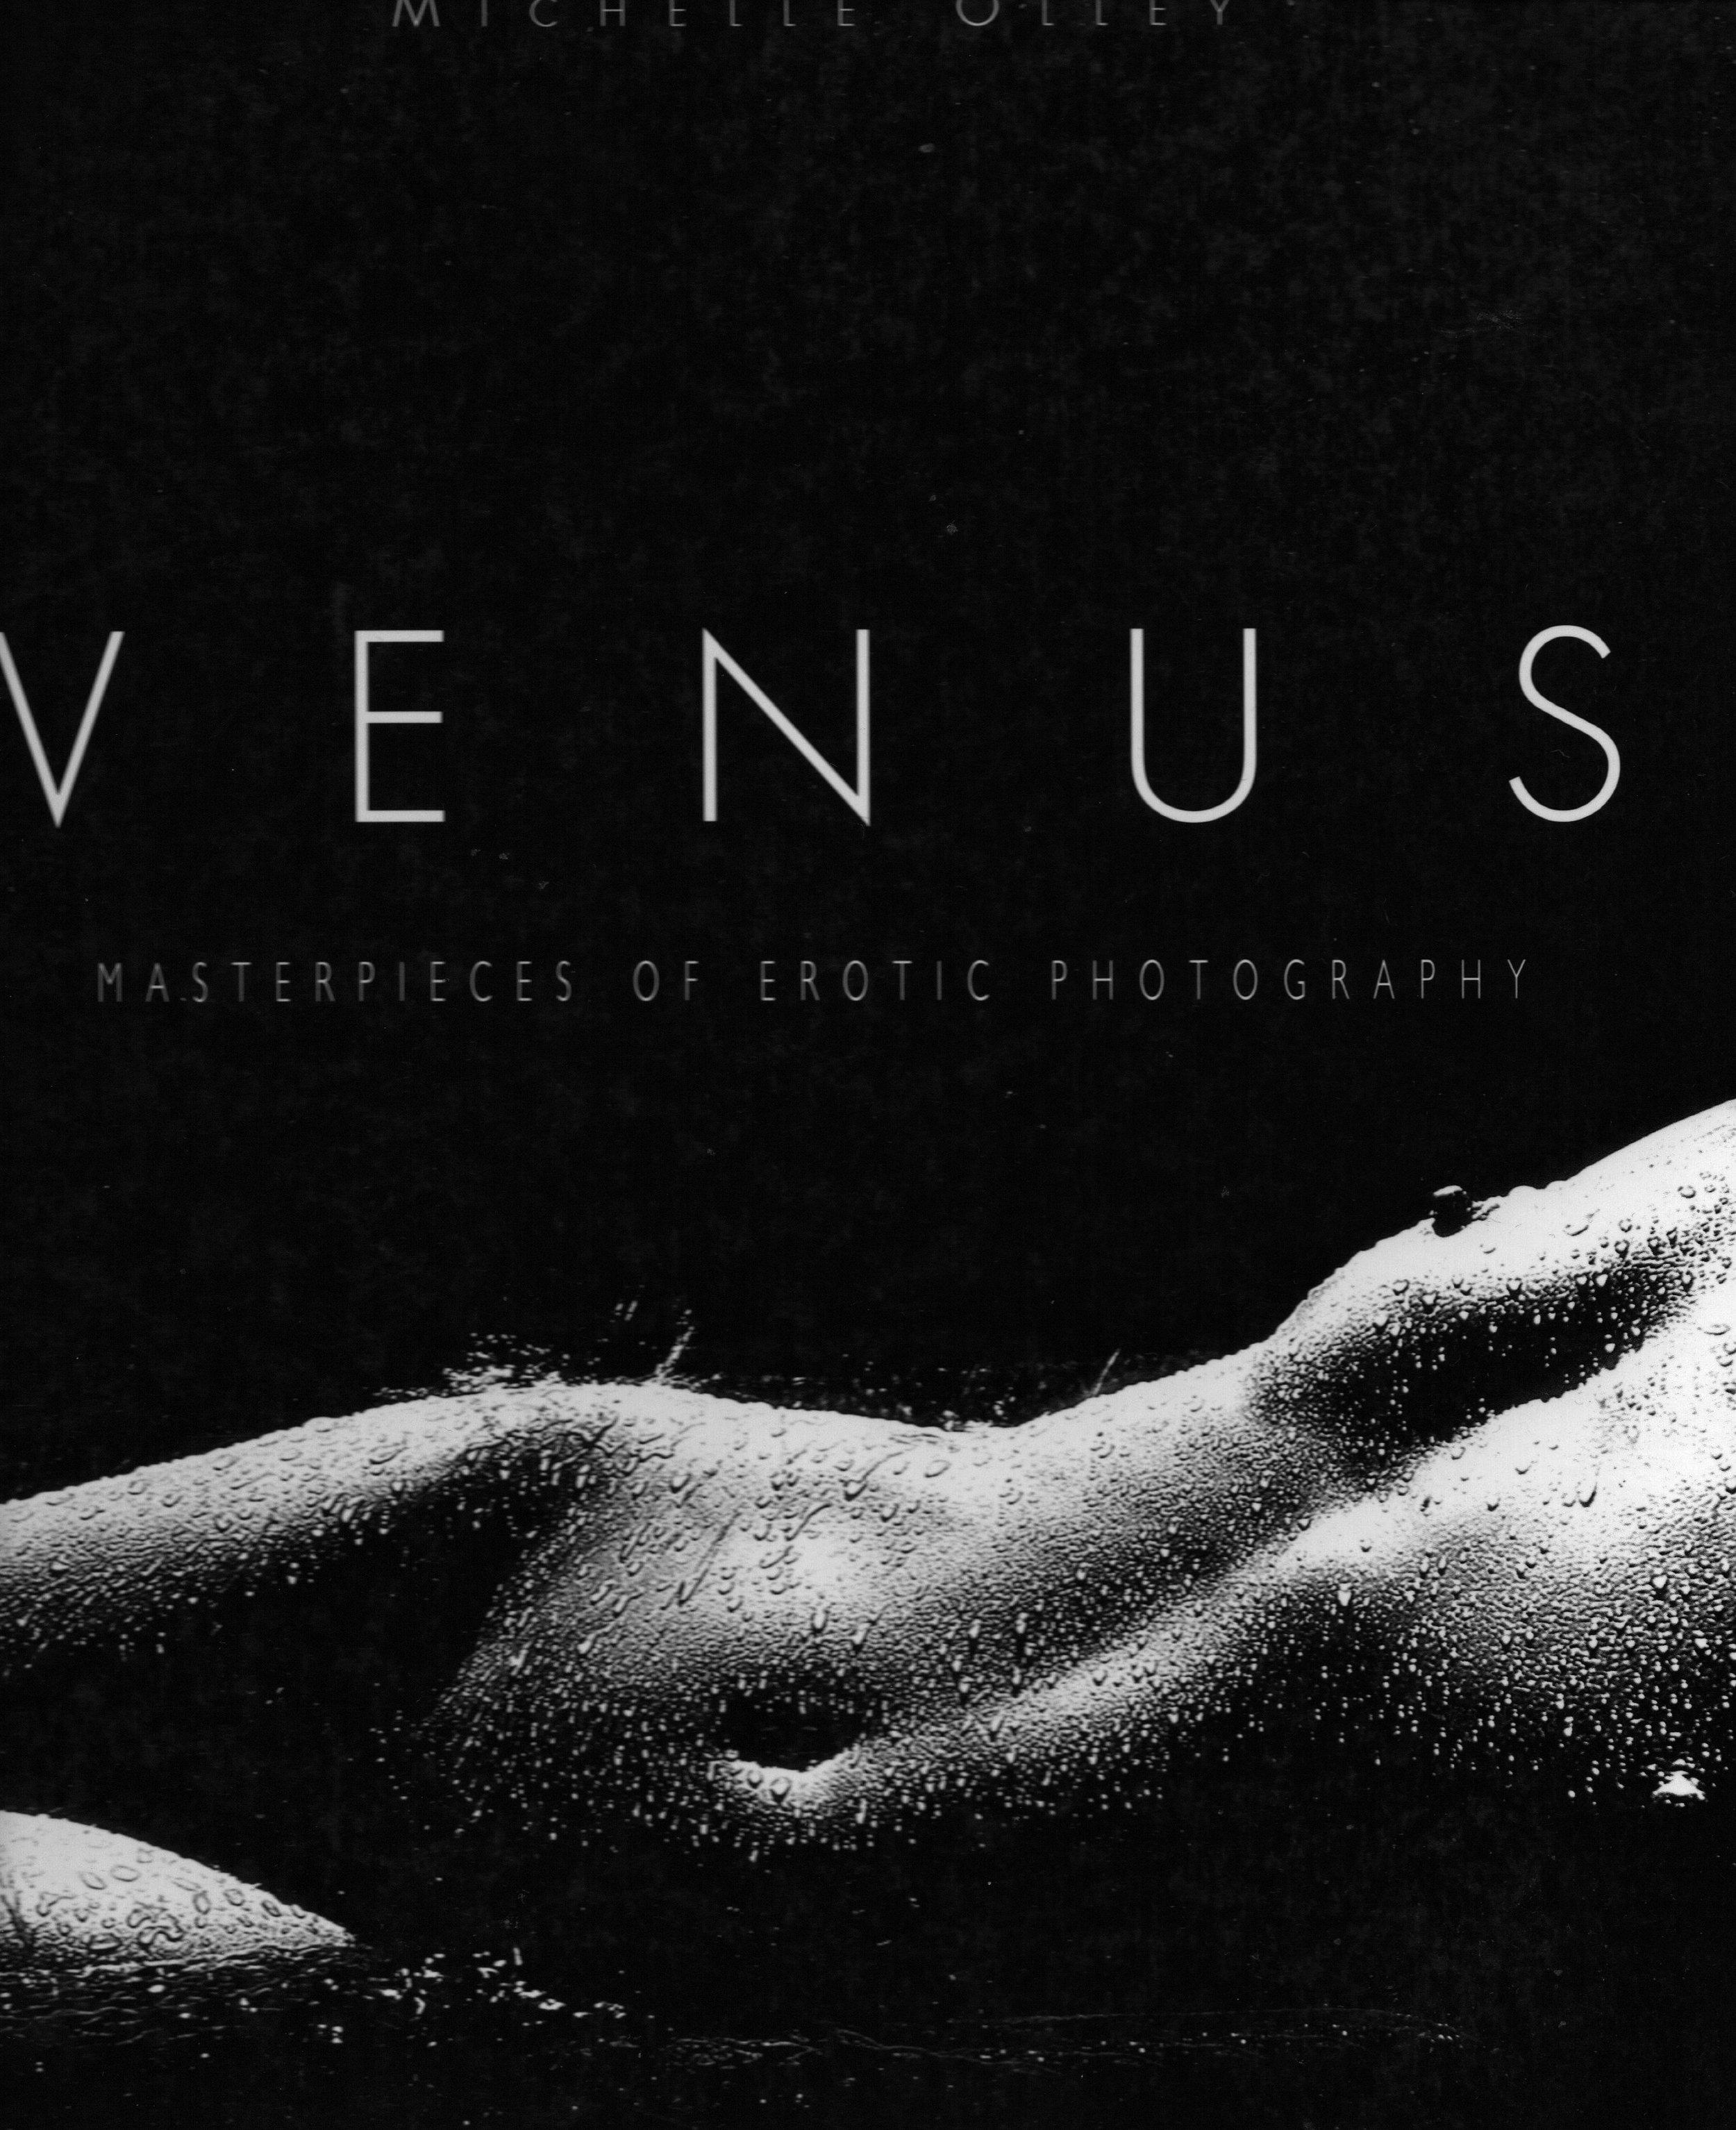 Marco Sanges Book - Venus 1.jpeg